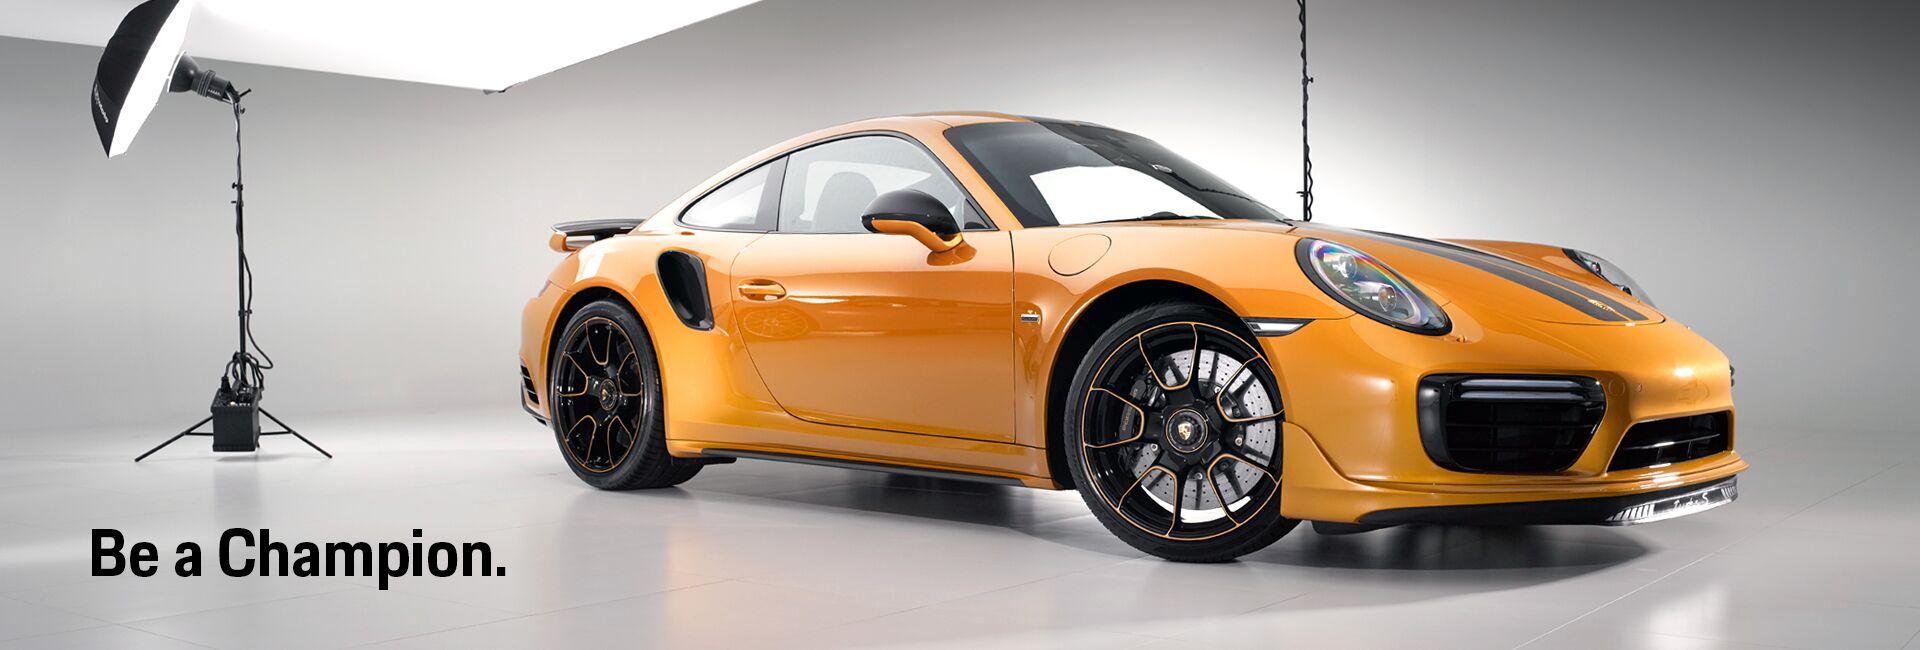 Porsche Dealership Pompano Beach FL | Used Cars Champion Porsche